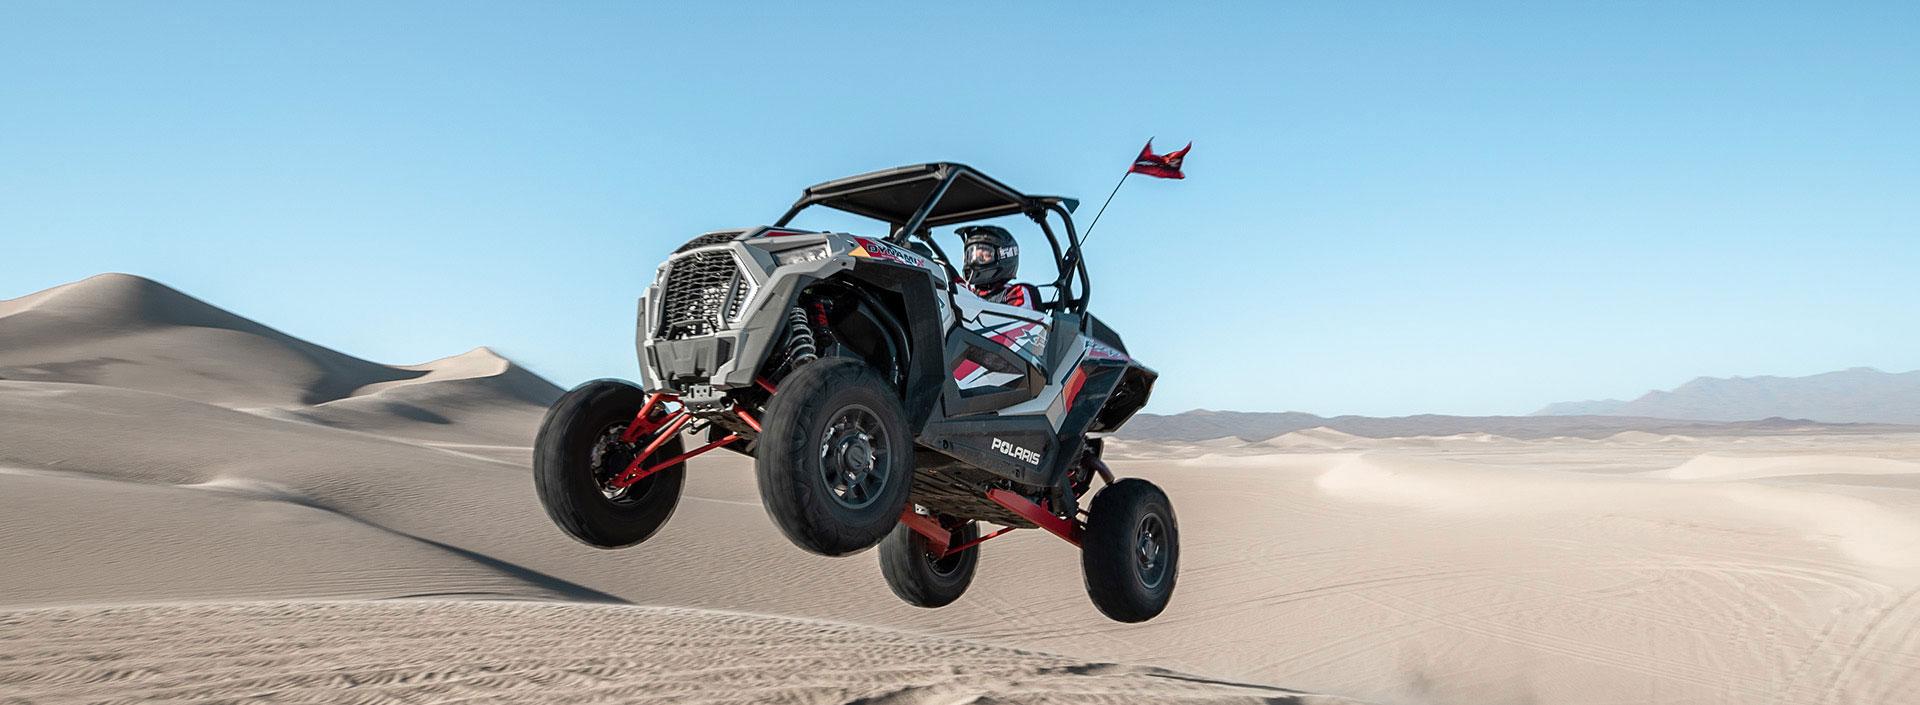 Polaris® RZR jumping over a sand dune.